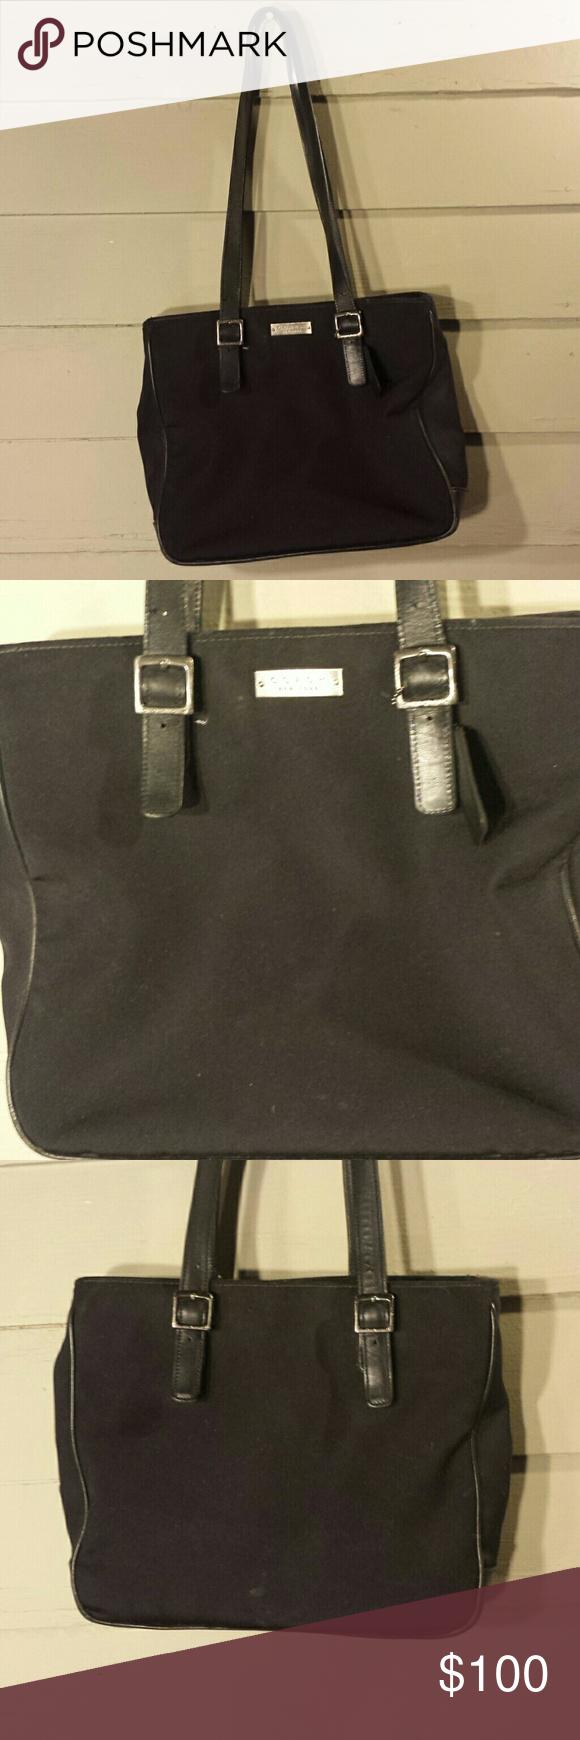 Coach Handbag Good condition  3 inside pockets 1 zip Coach Bags